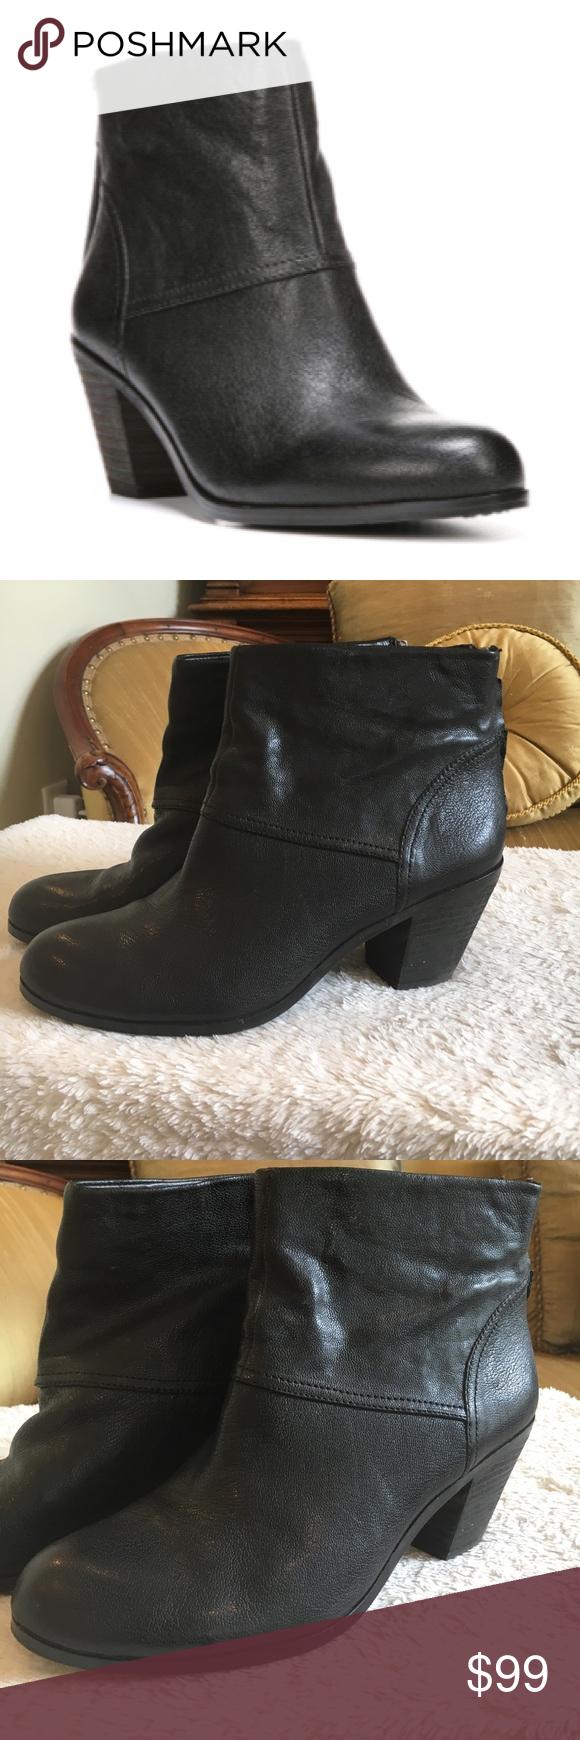 e5be9f1019edd 👢BOOT SALE👢 Sam Edelman Larkin leather boots